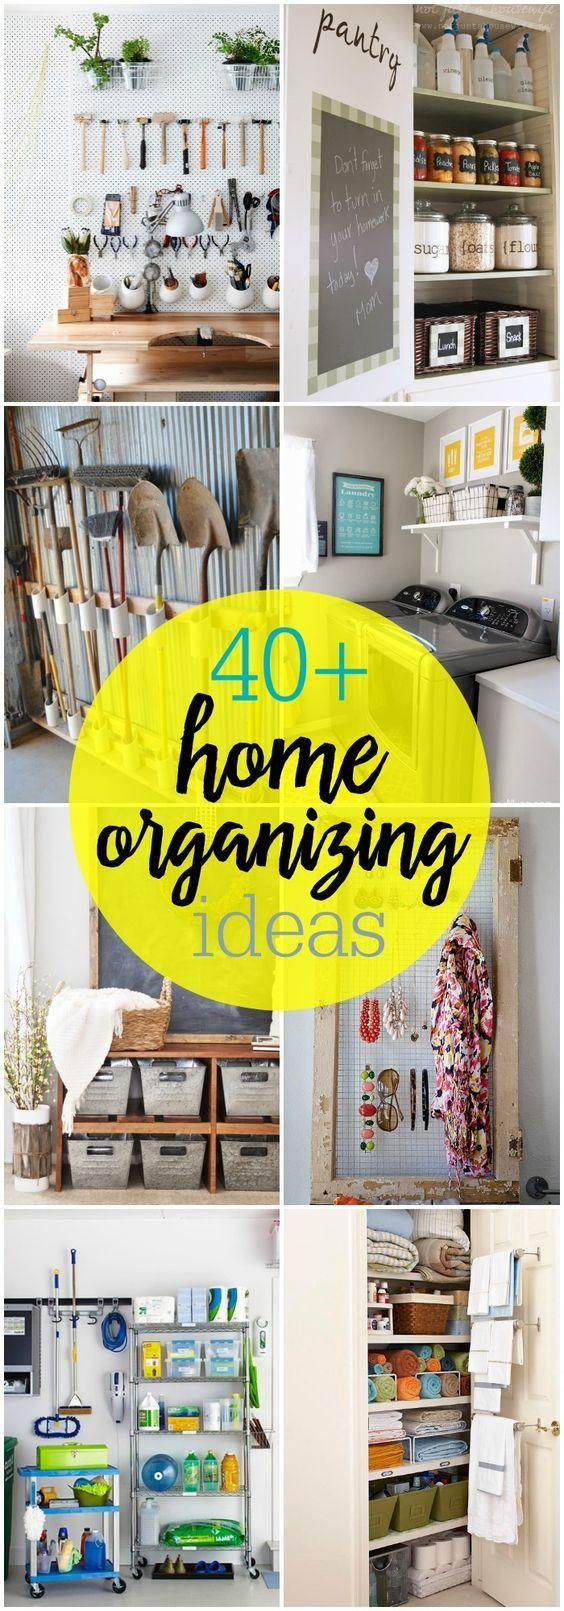 169 best Decluttering images on Pinterest | Organization ideas ...